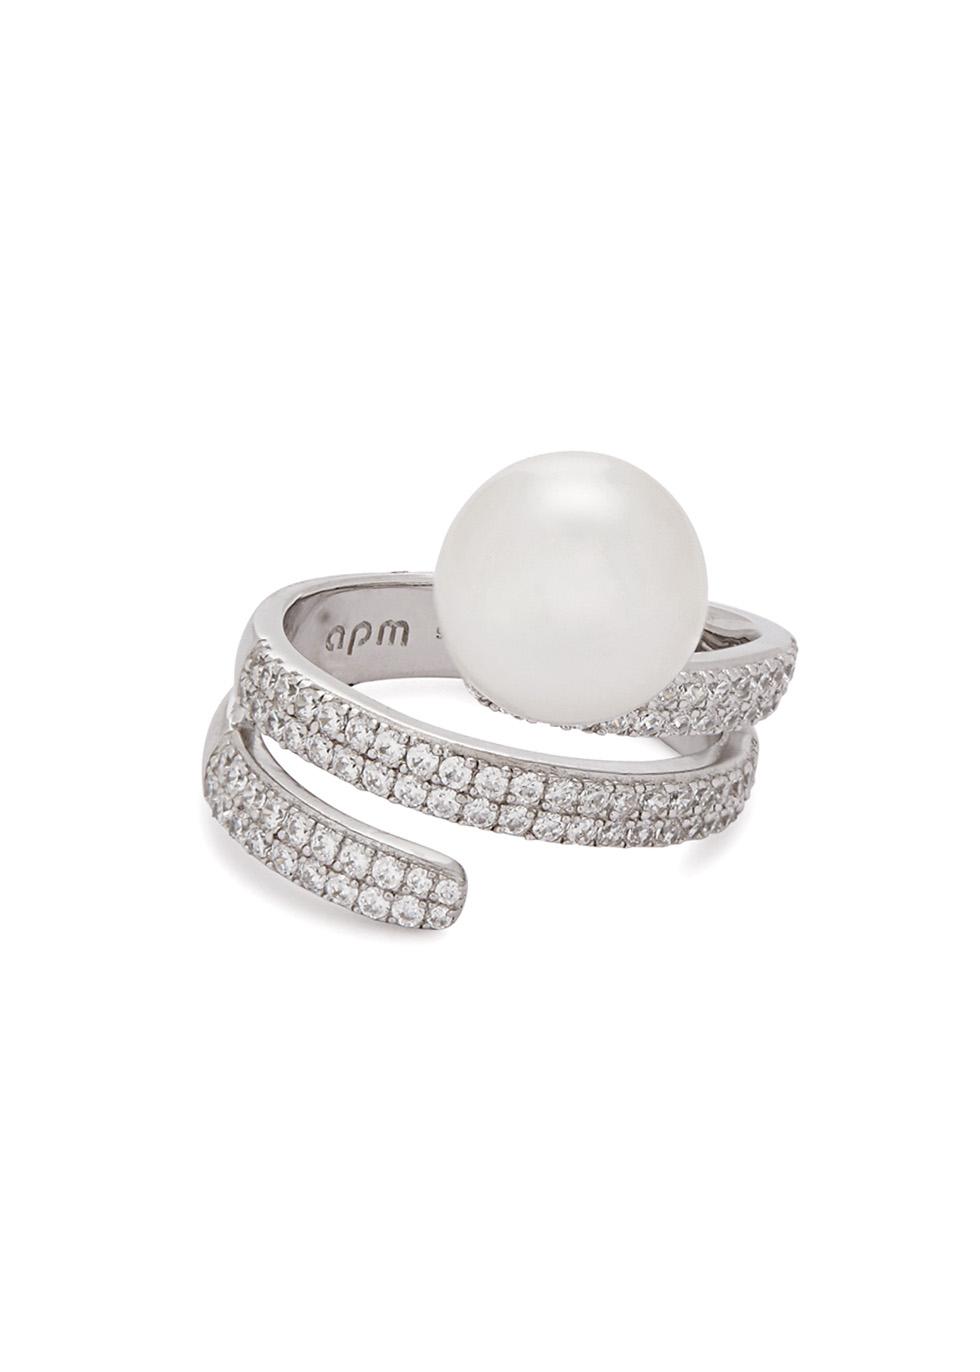 Crystal-embellished sterling silver ring - APM Monaco